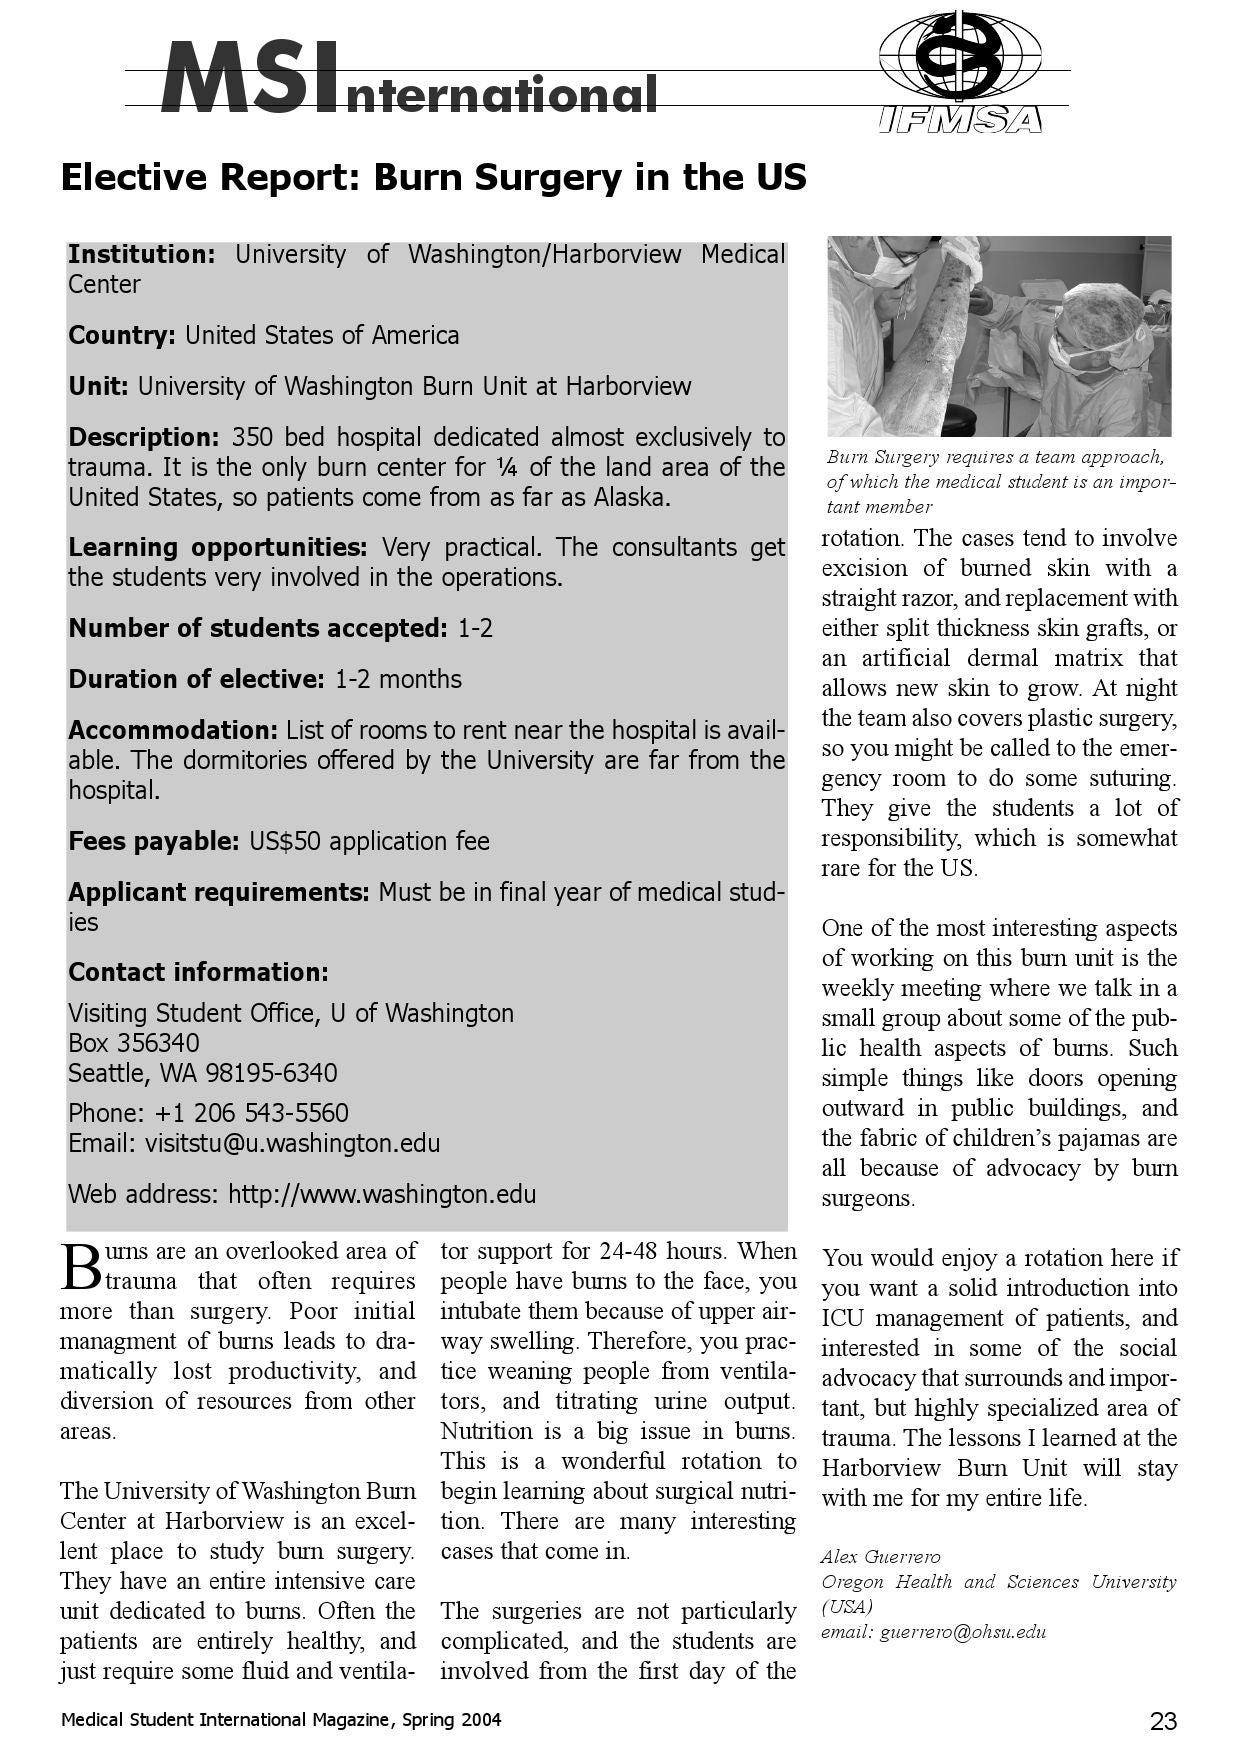 The Medical Student International 10